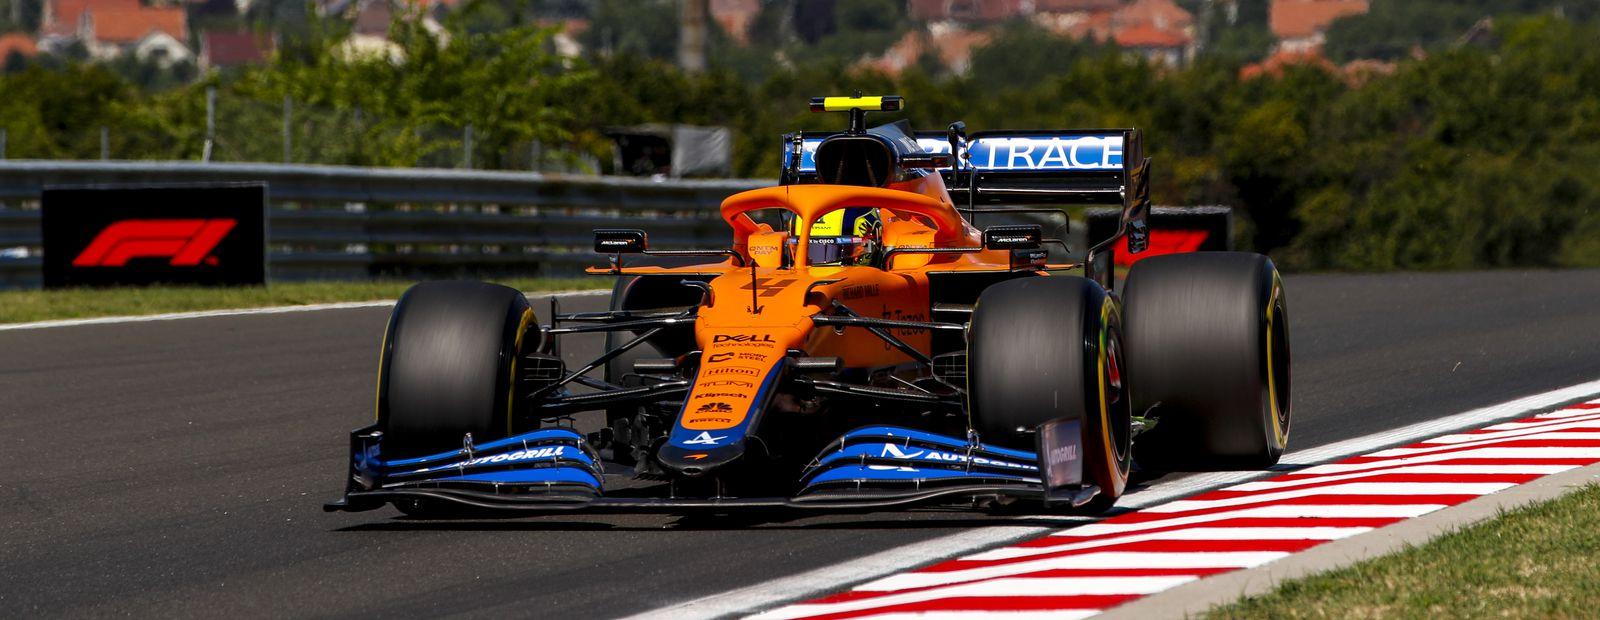 2021 Hungarian Grand Prix – Free Practice